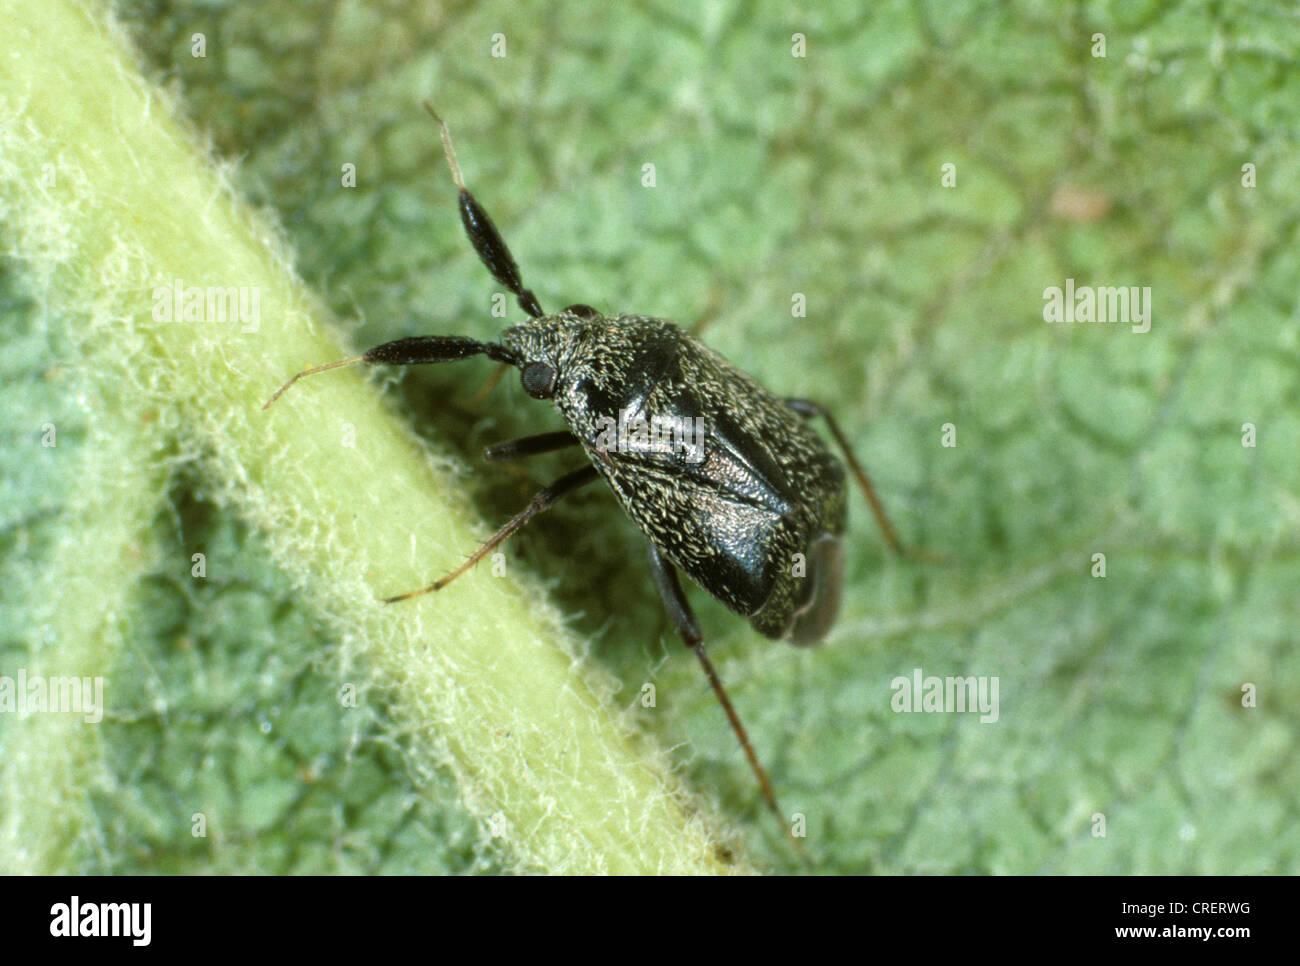 Schwarze Apfel Kapsid (Atractotomus Mali) Pest Raubtier auf Apfel-Blatt Stockbild